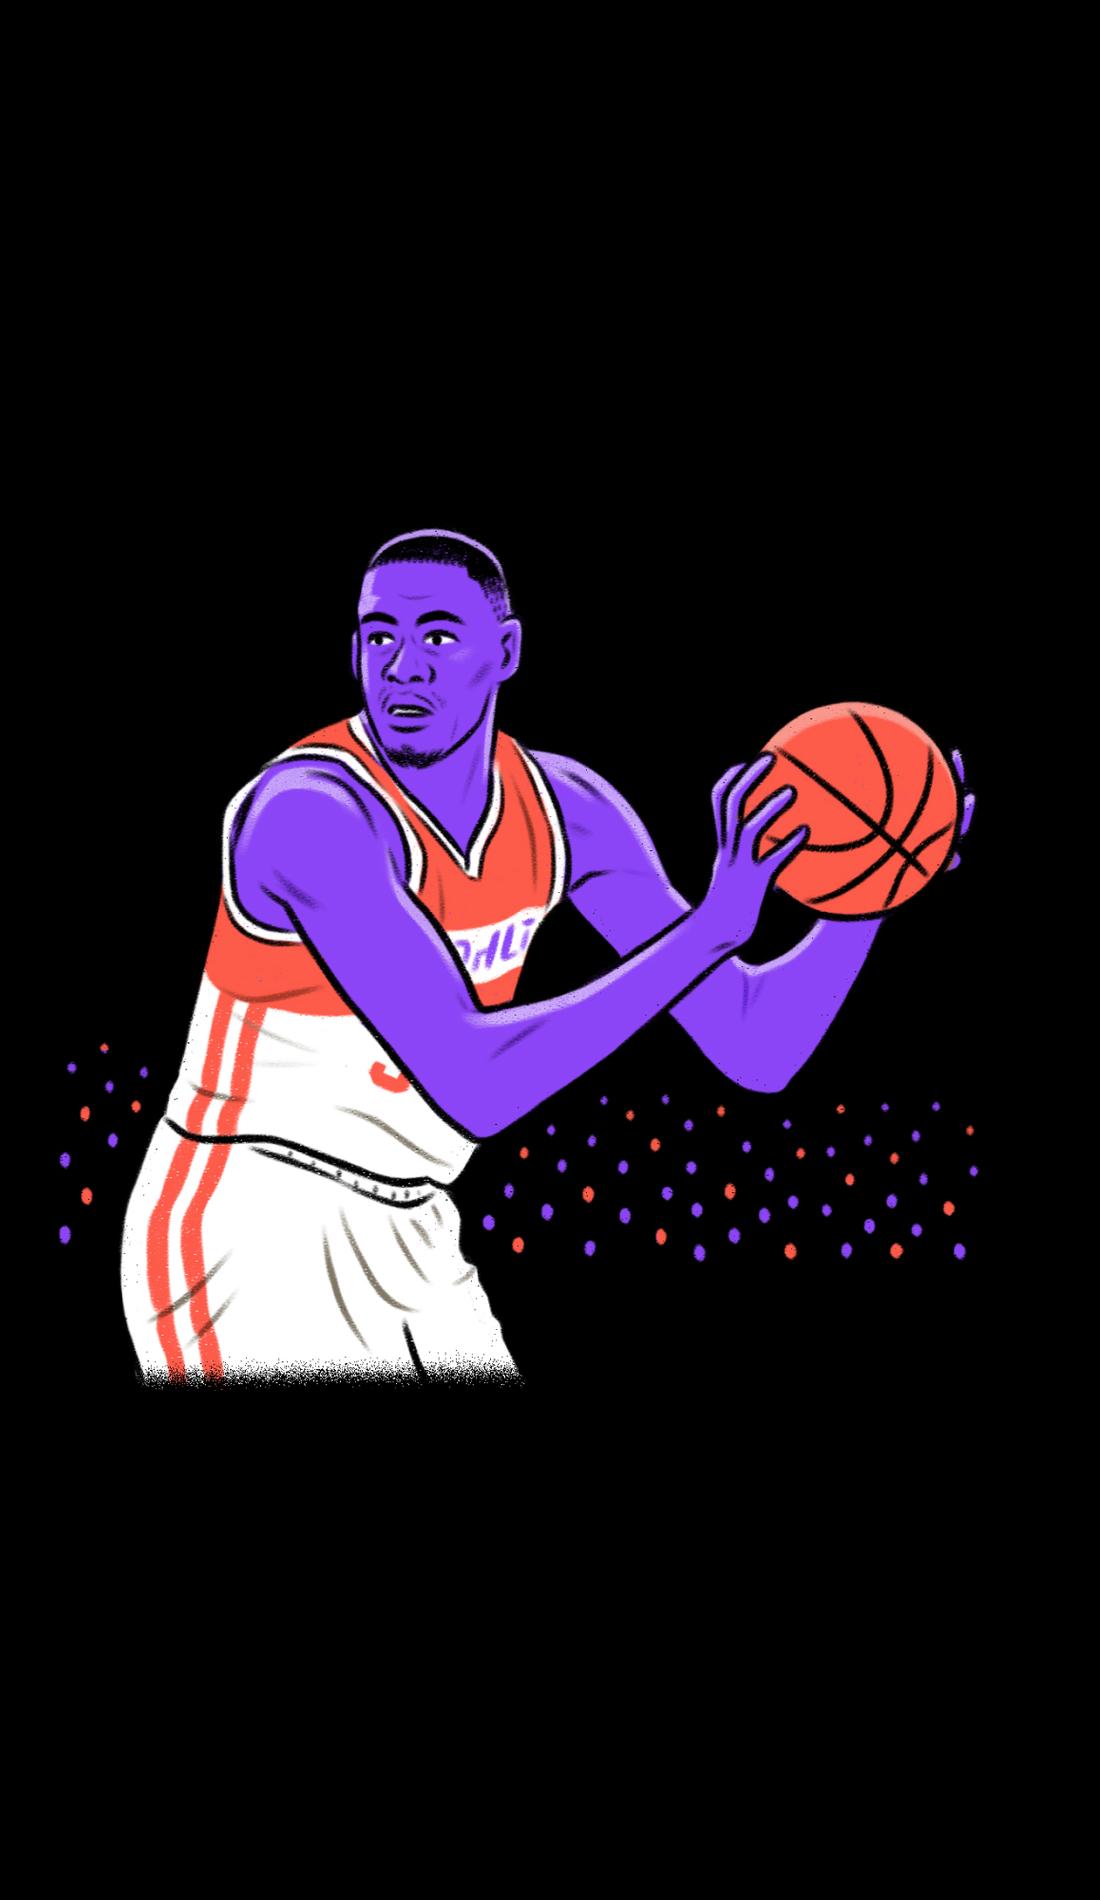 A Southeast Missouri State Redhawks Basketball live event